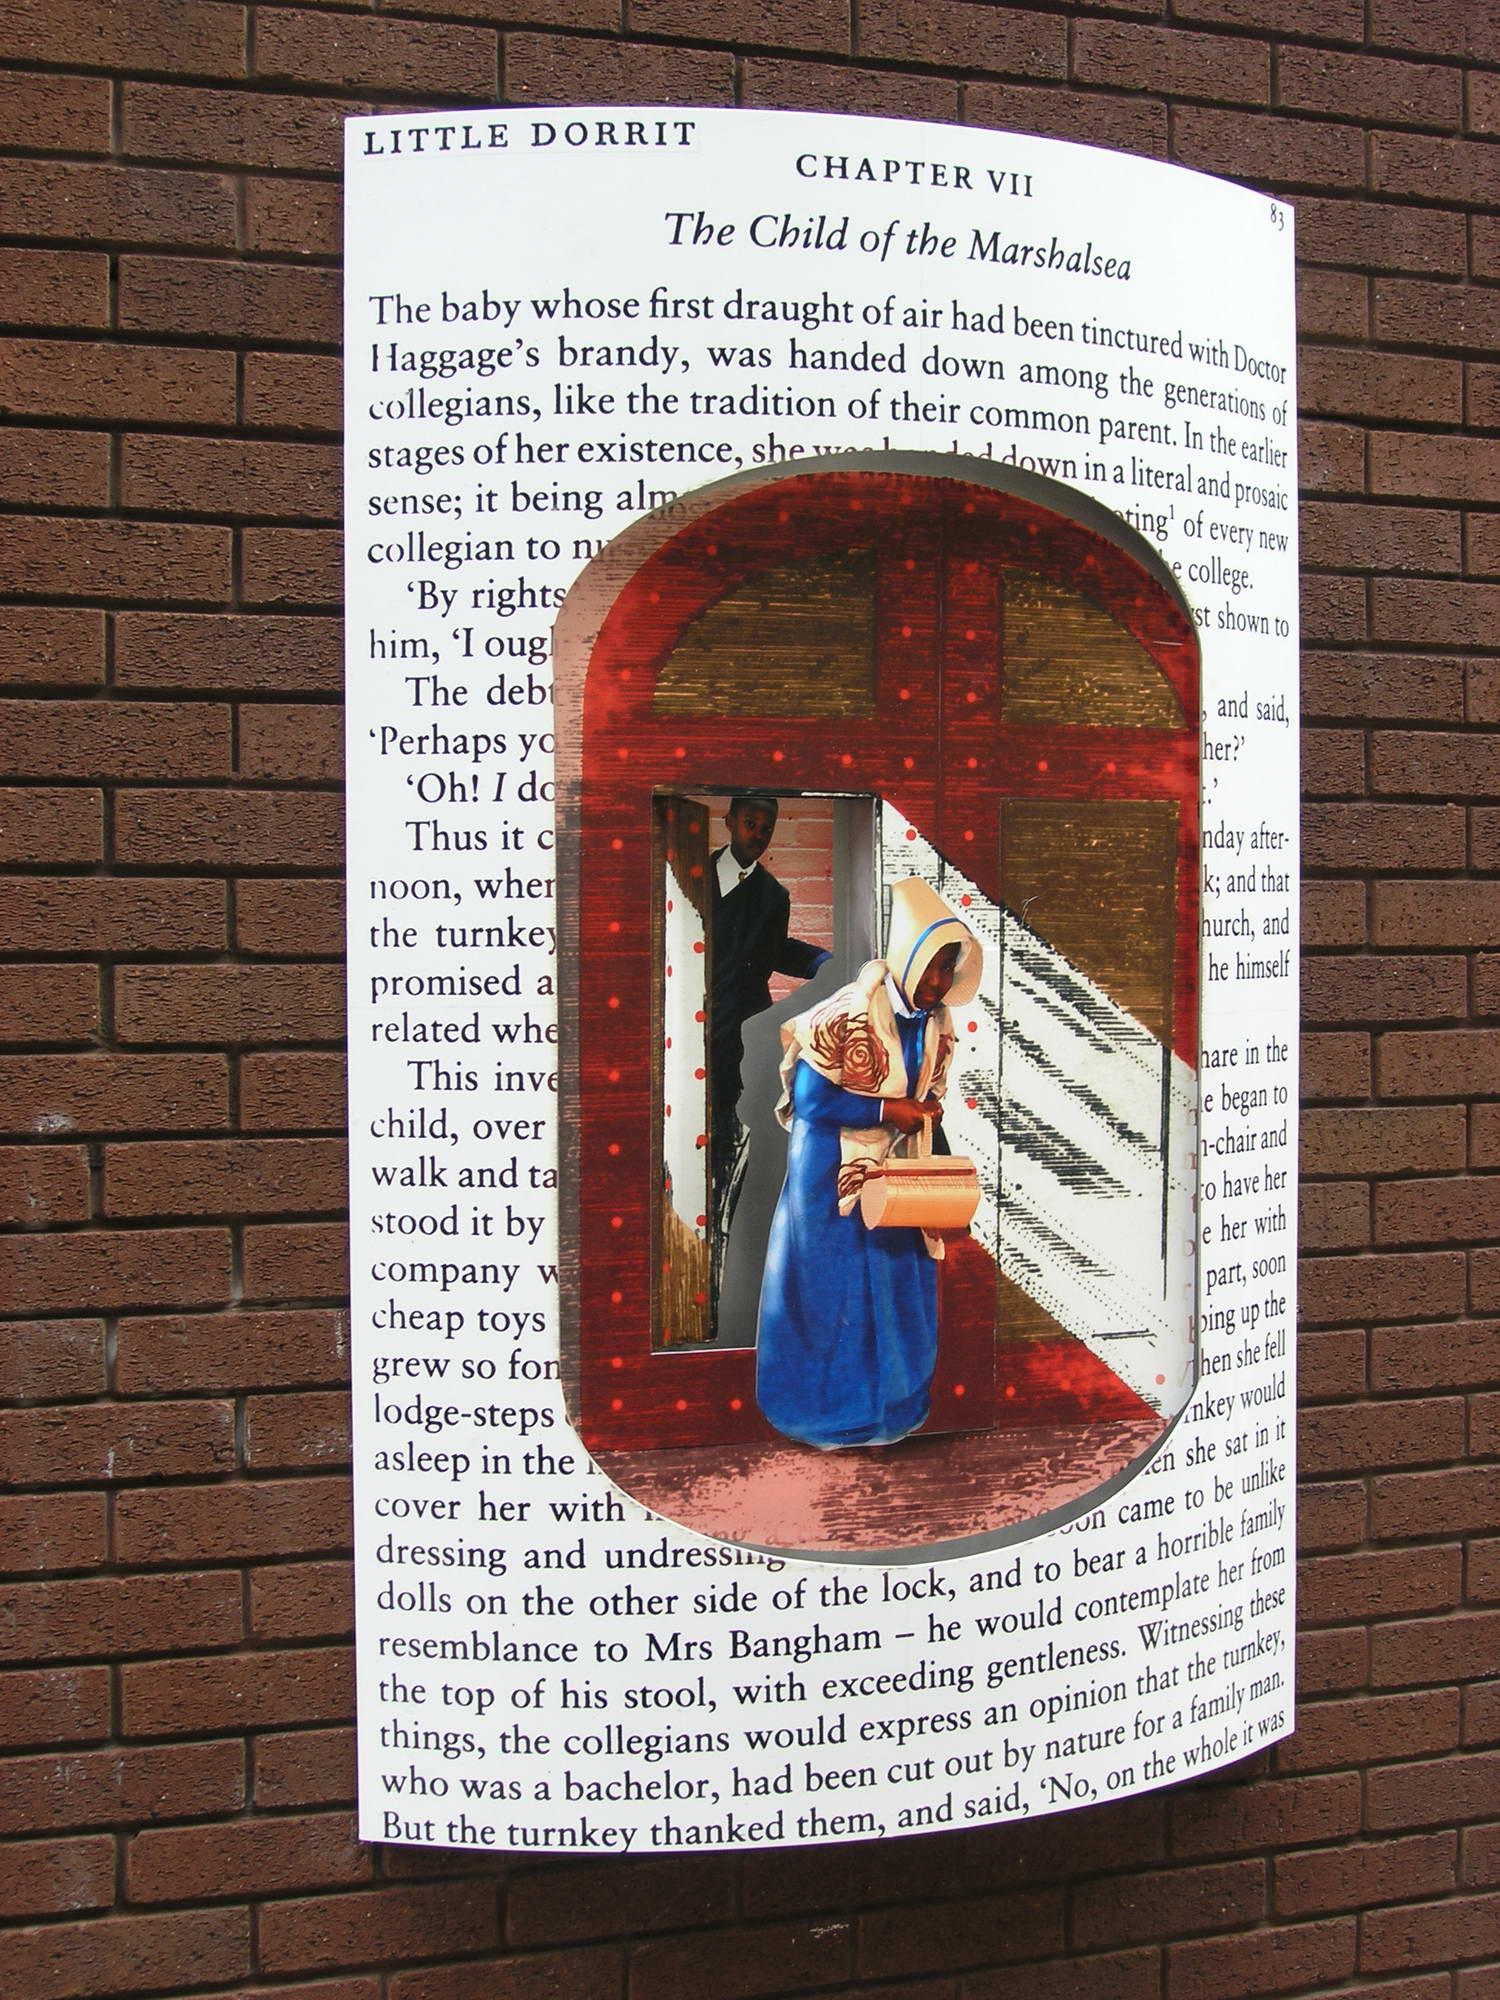 Little Dorrit exiting the gate of the Marshalsea Prison.